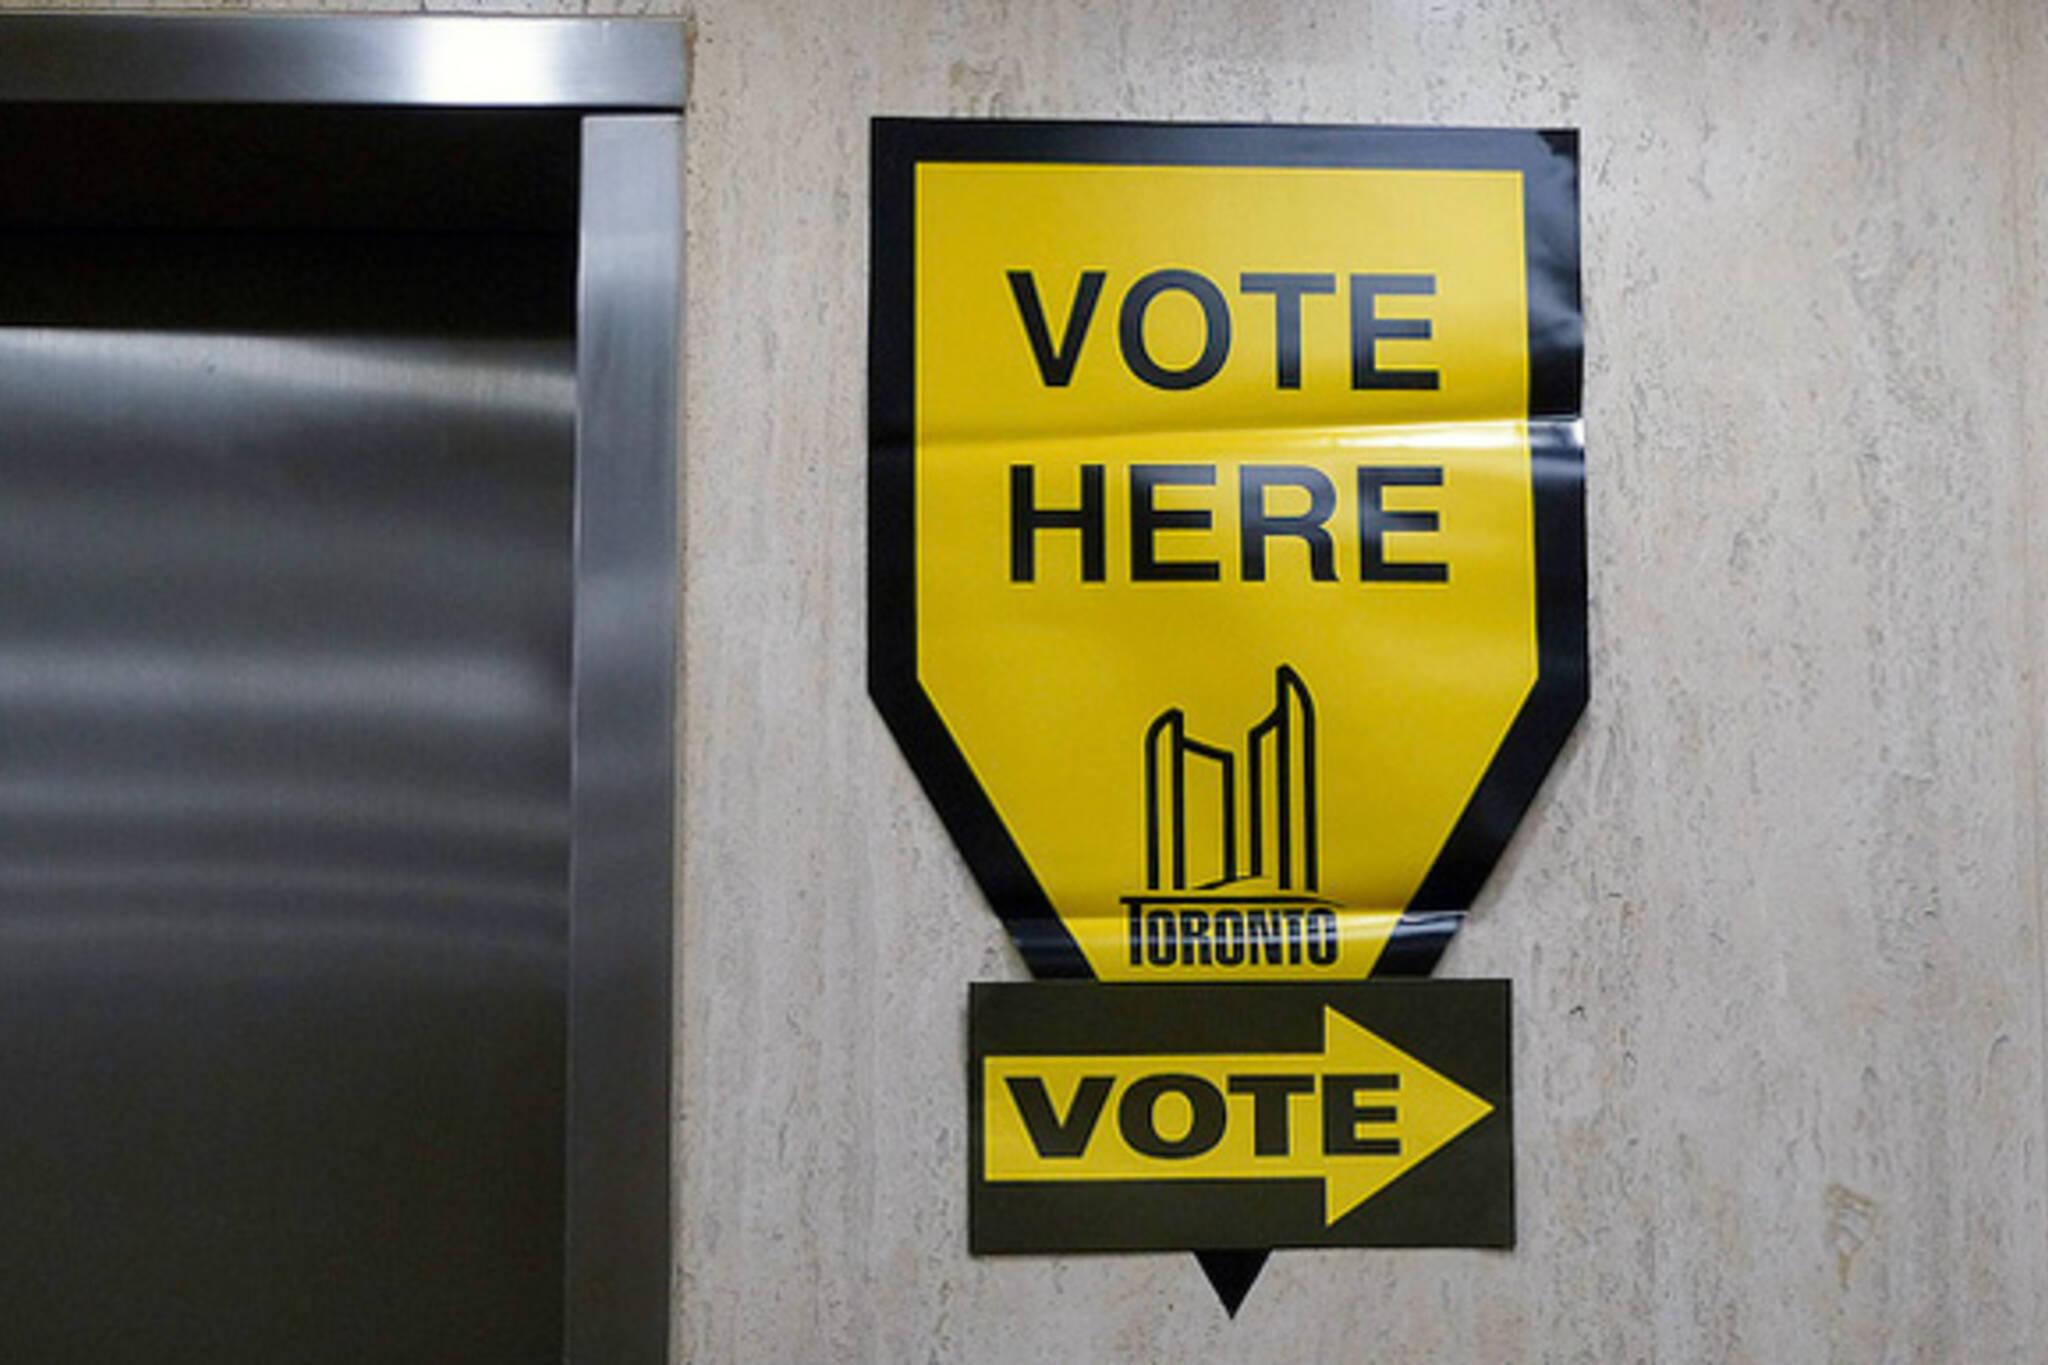 Vote Provincial Election Toronto